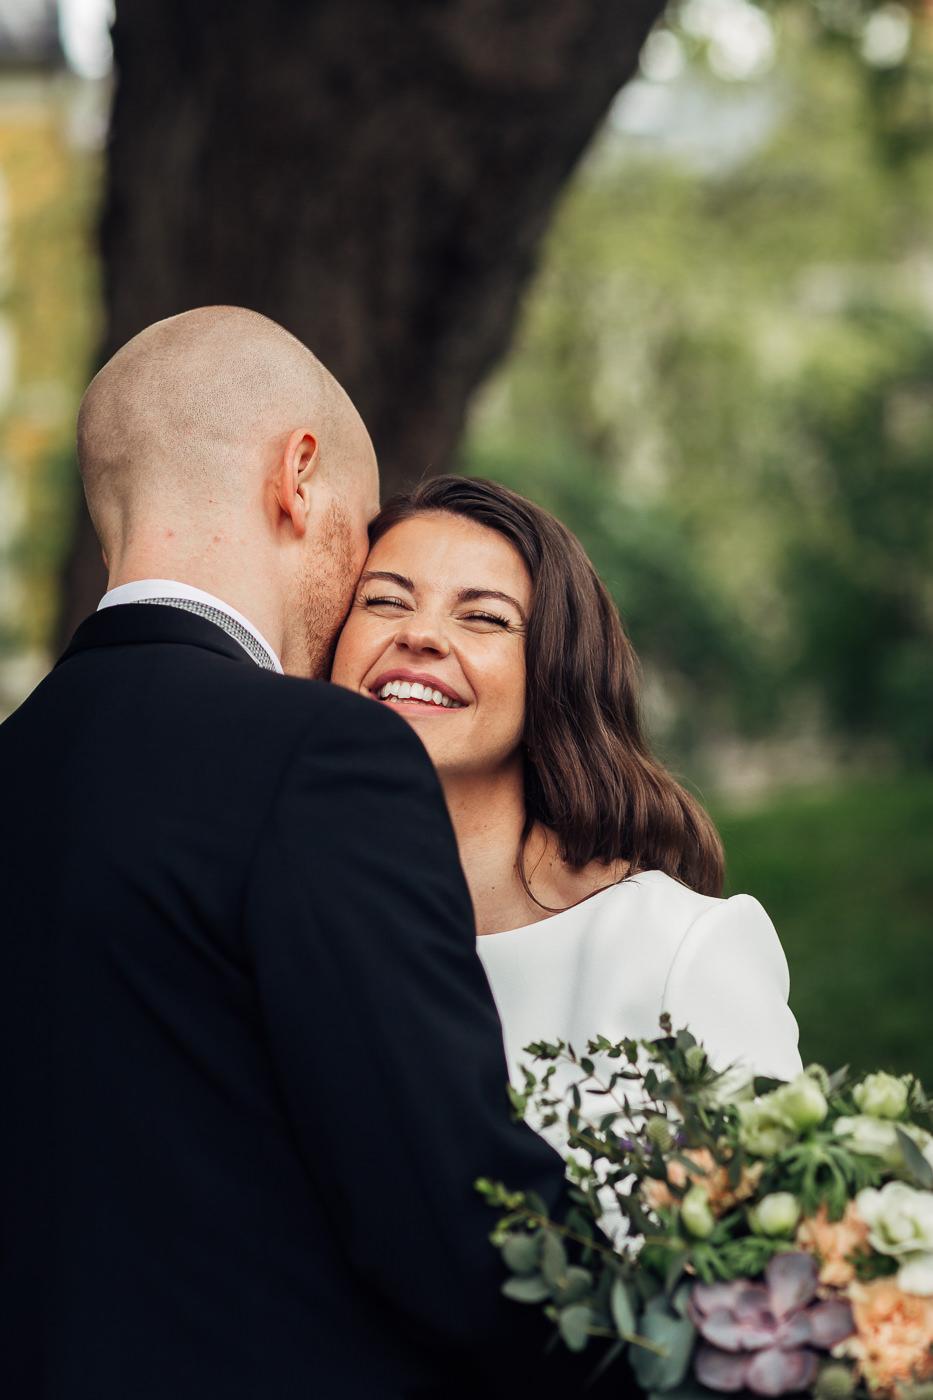 Malene & Ole Martin - elegant dansk- norskt bryllup i Oslo Bryllup Gamle Aker Oslo 44 Akershus